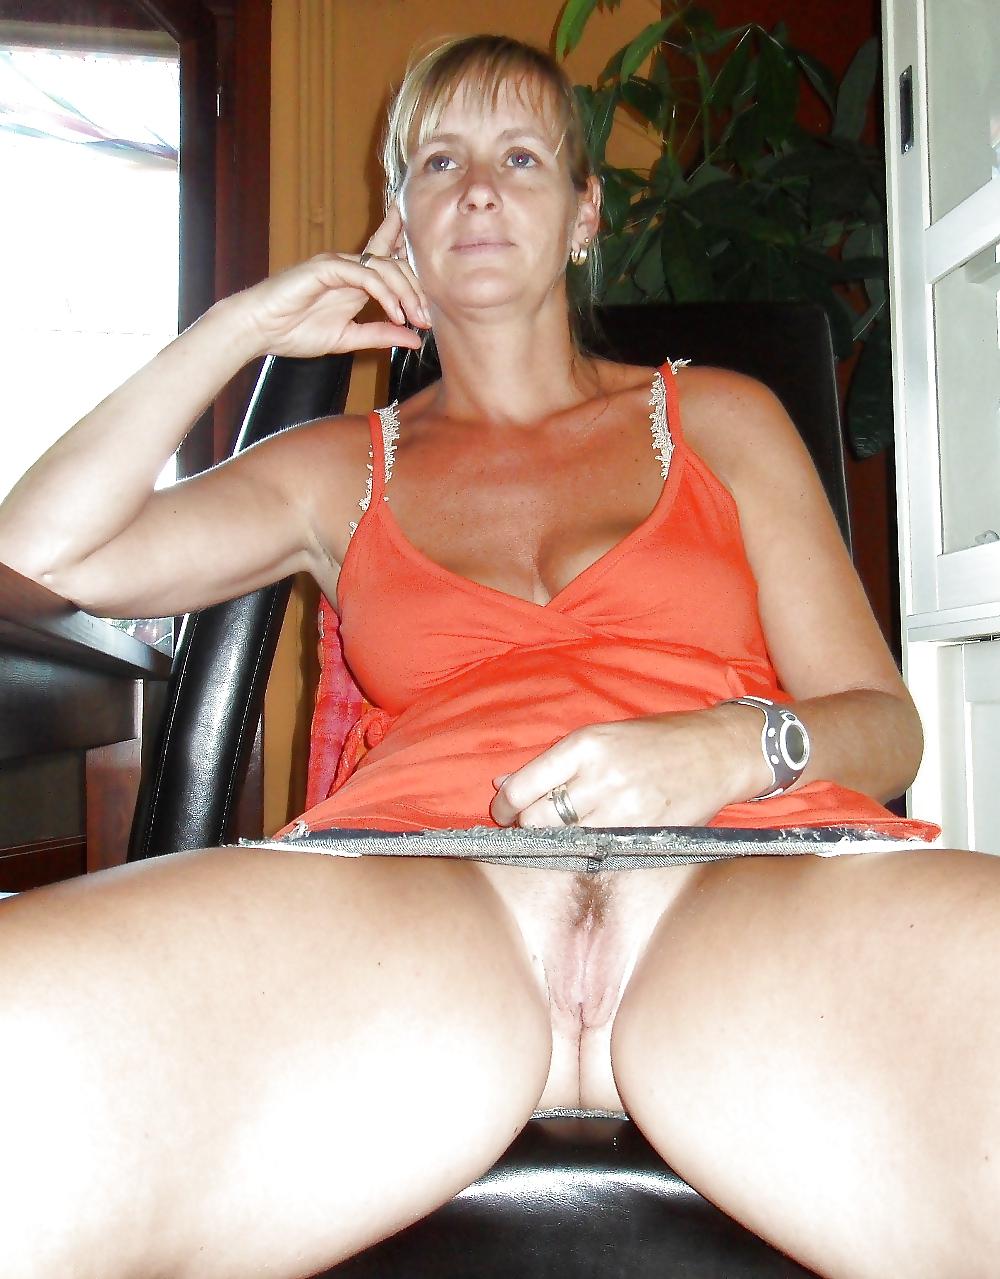 Nude hausfrau Hausfrau: 43,044